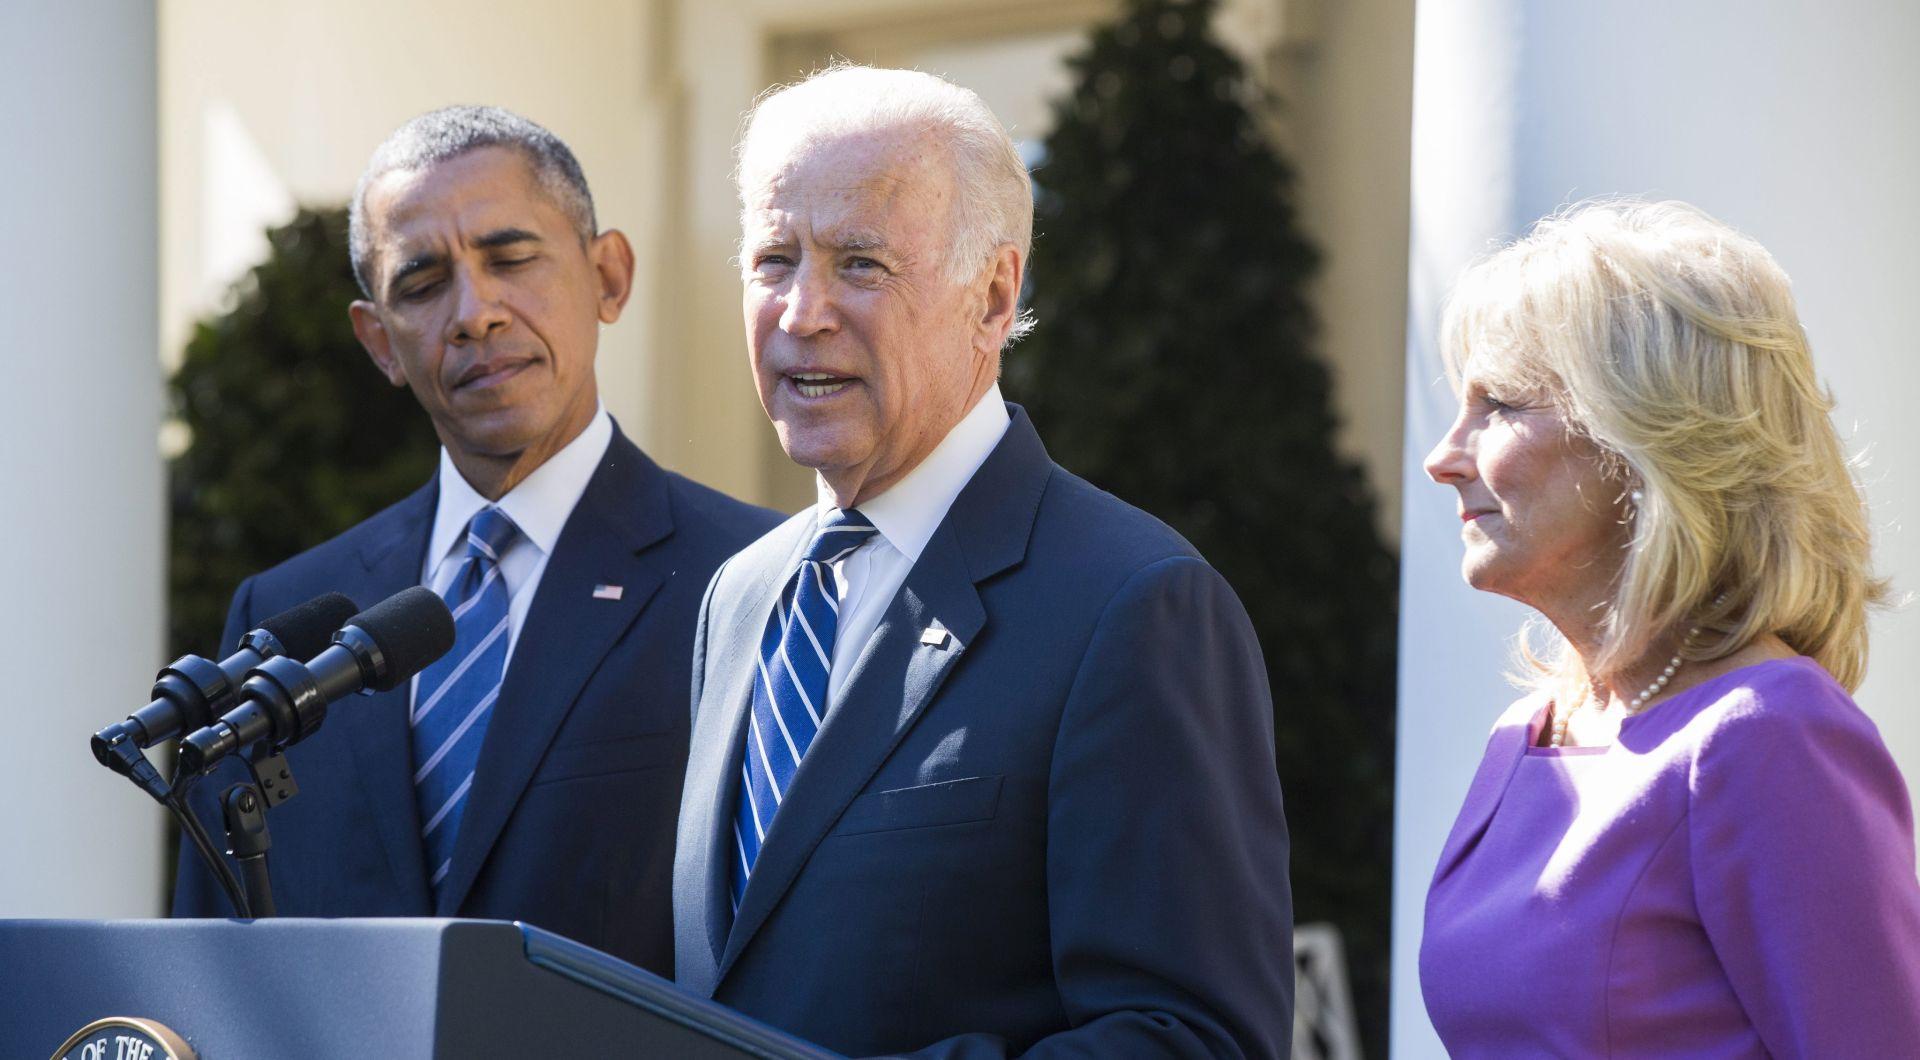 VELIKI AMERIČKI POVRATAK Joe Biden sutra u Zagrebu na summitu JI Europe